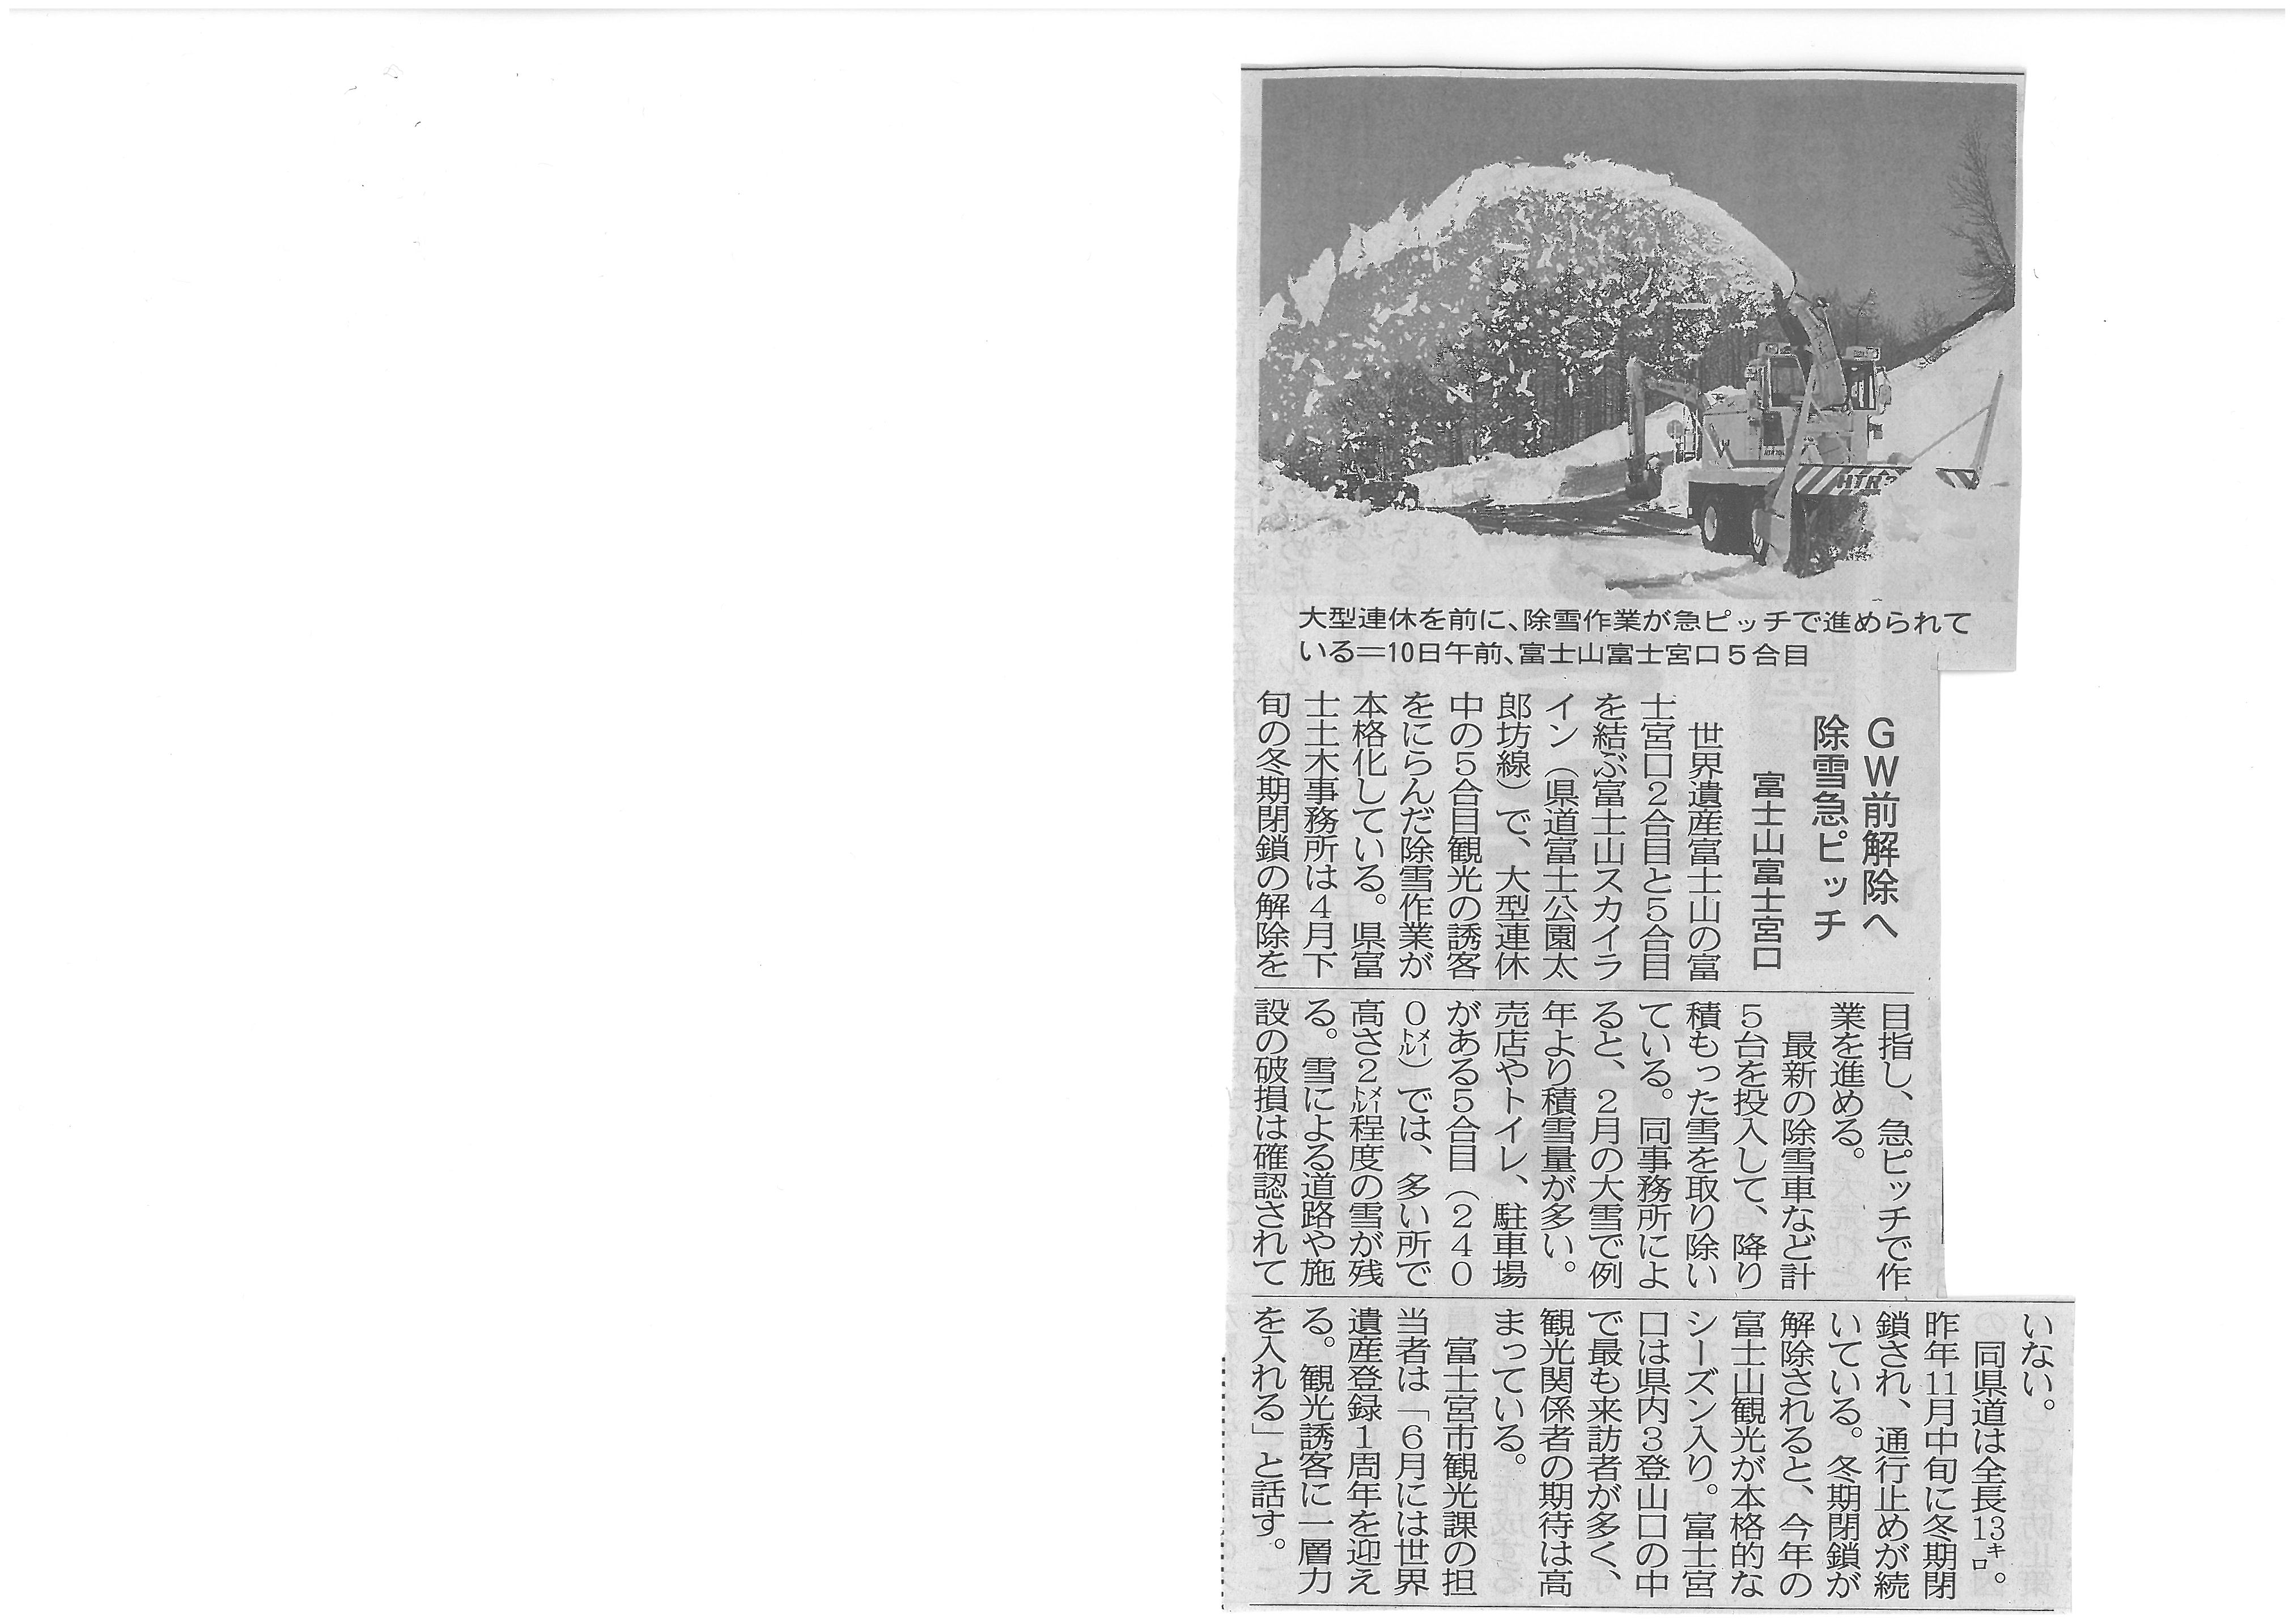 http://mtfuji.or.jp/img/media/_old/img/SKMBT_C22014041117500.jpg